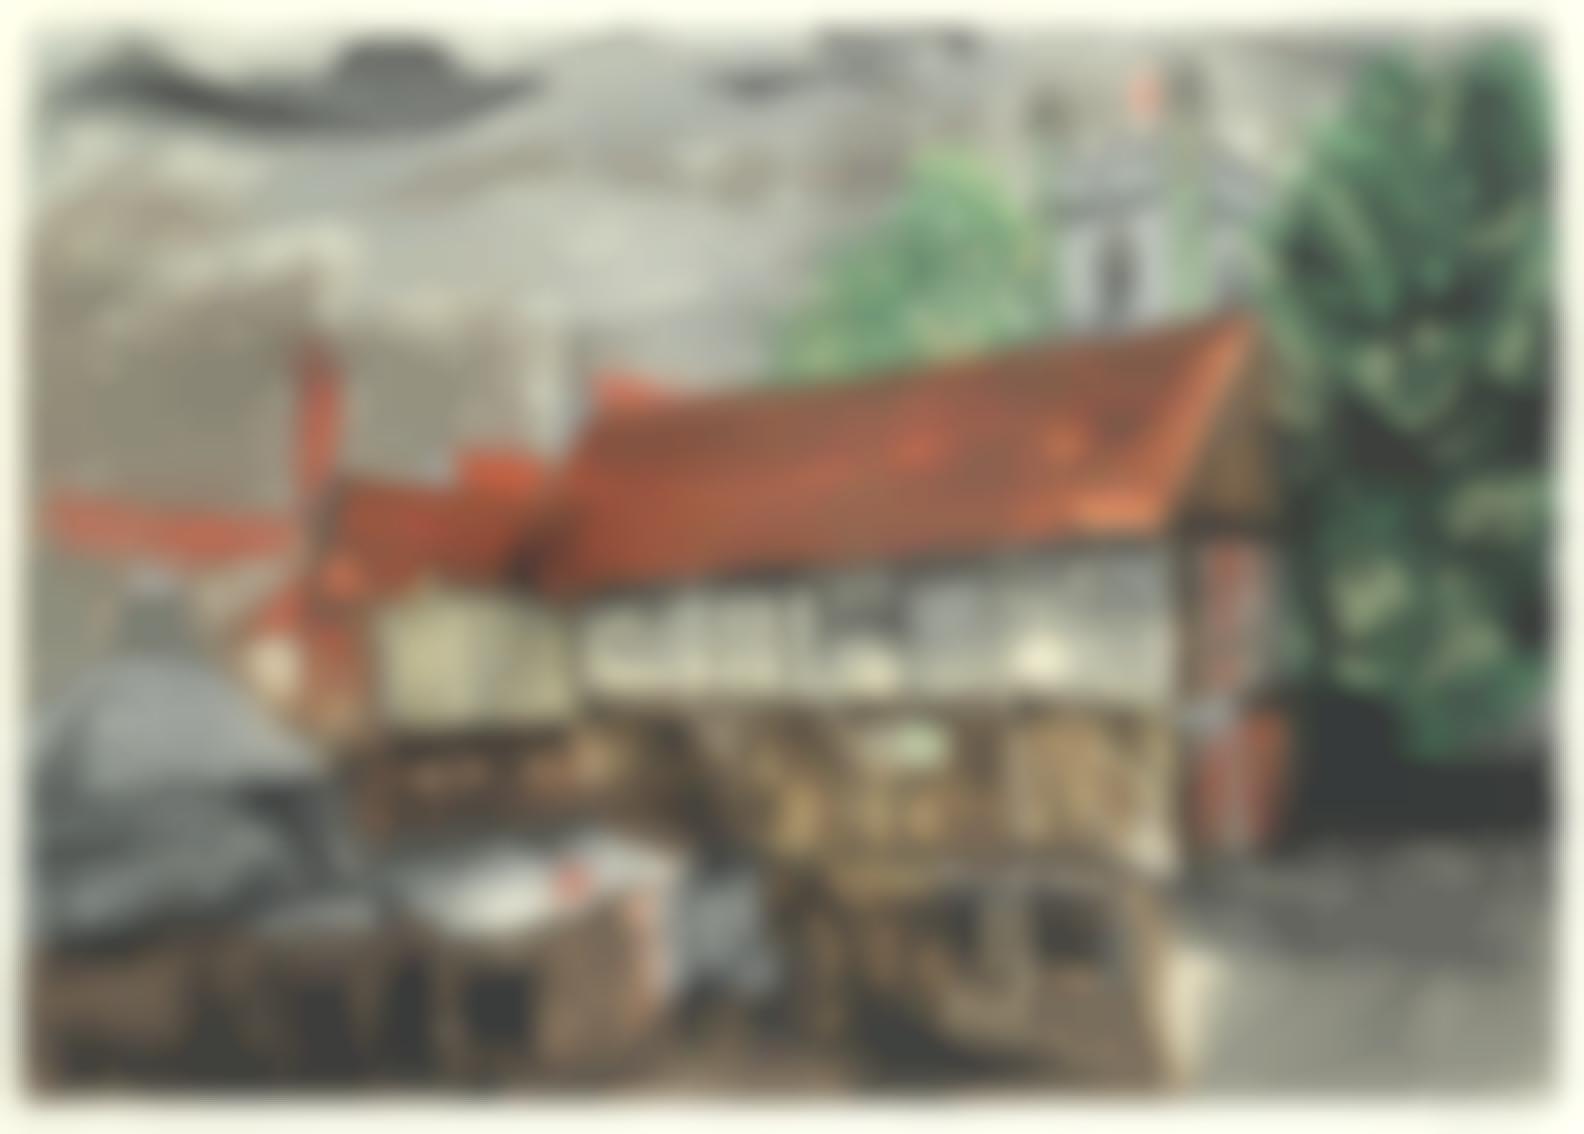 John Piper-Chantry House, Henley (Levinson 352)-1983